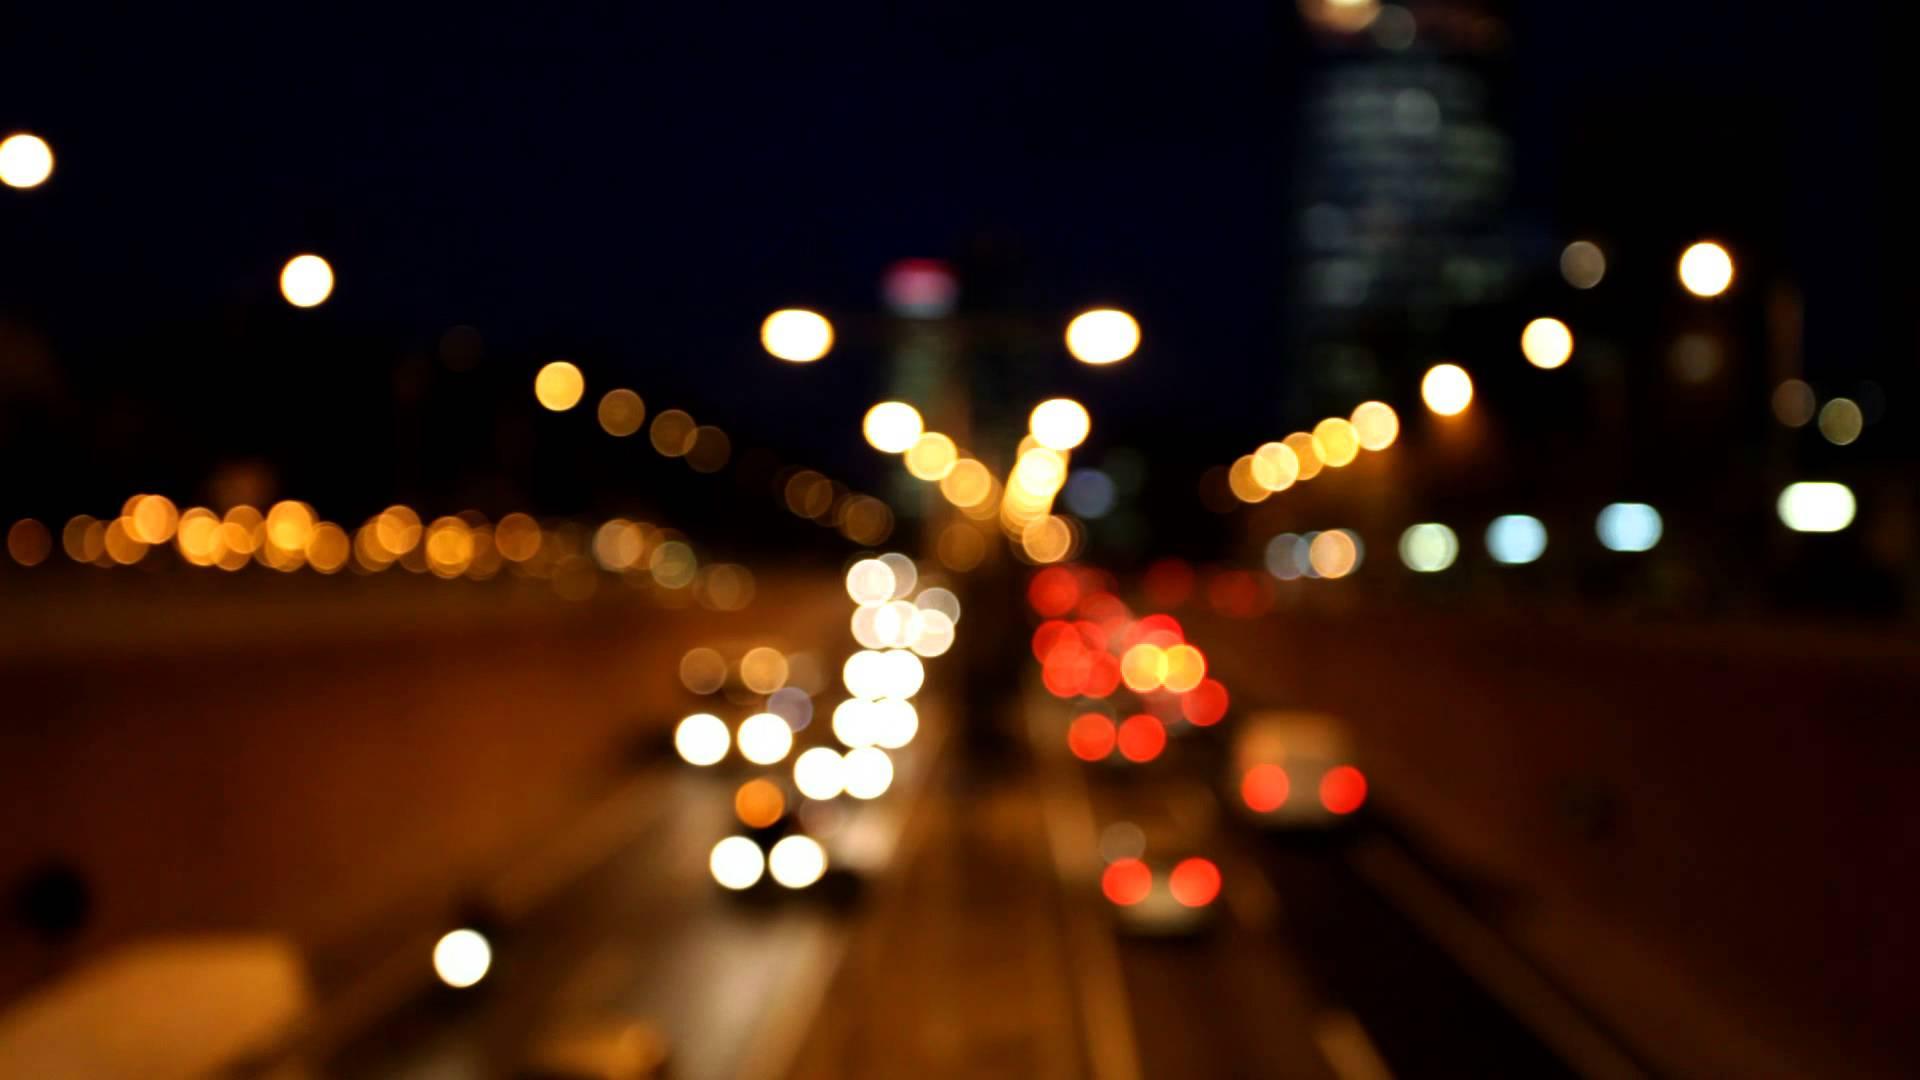 blurred car traffic lights - YouTube